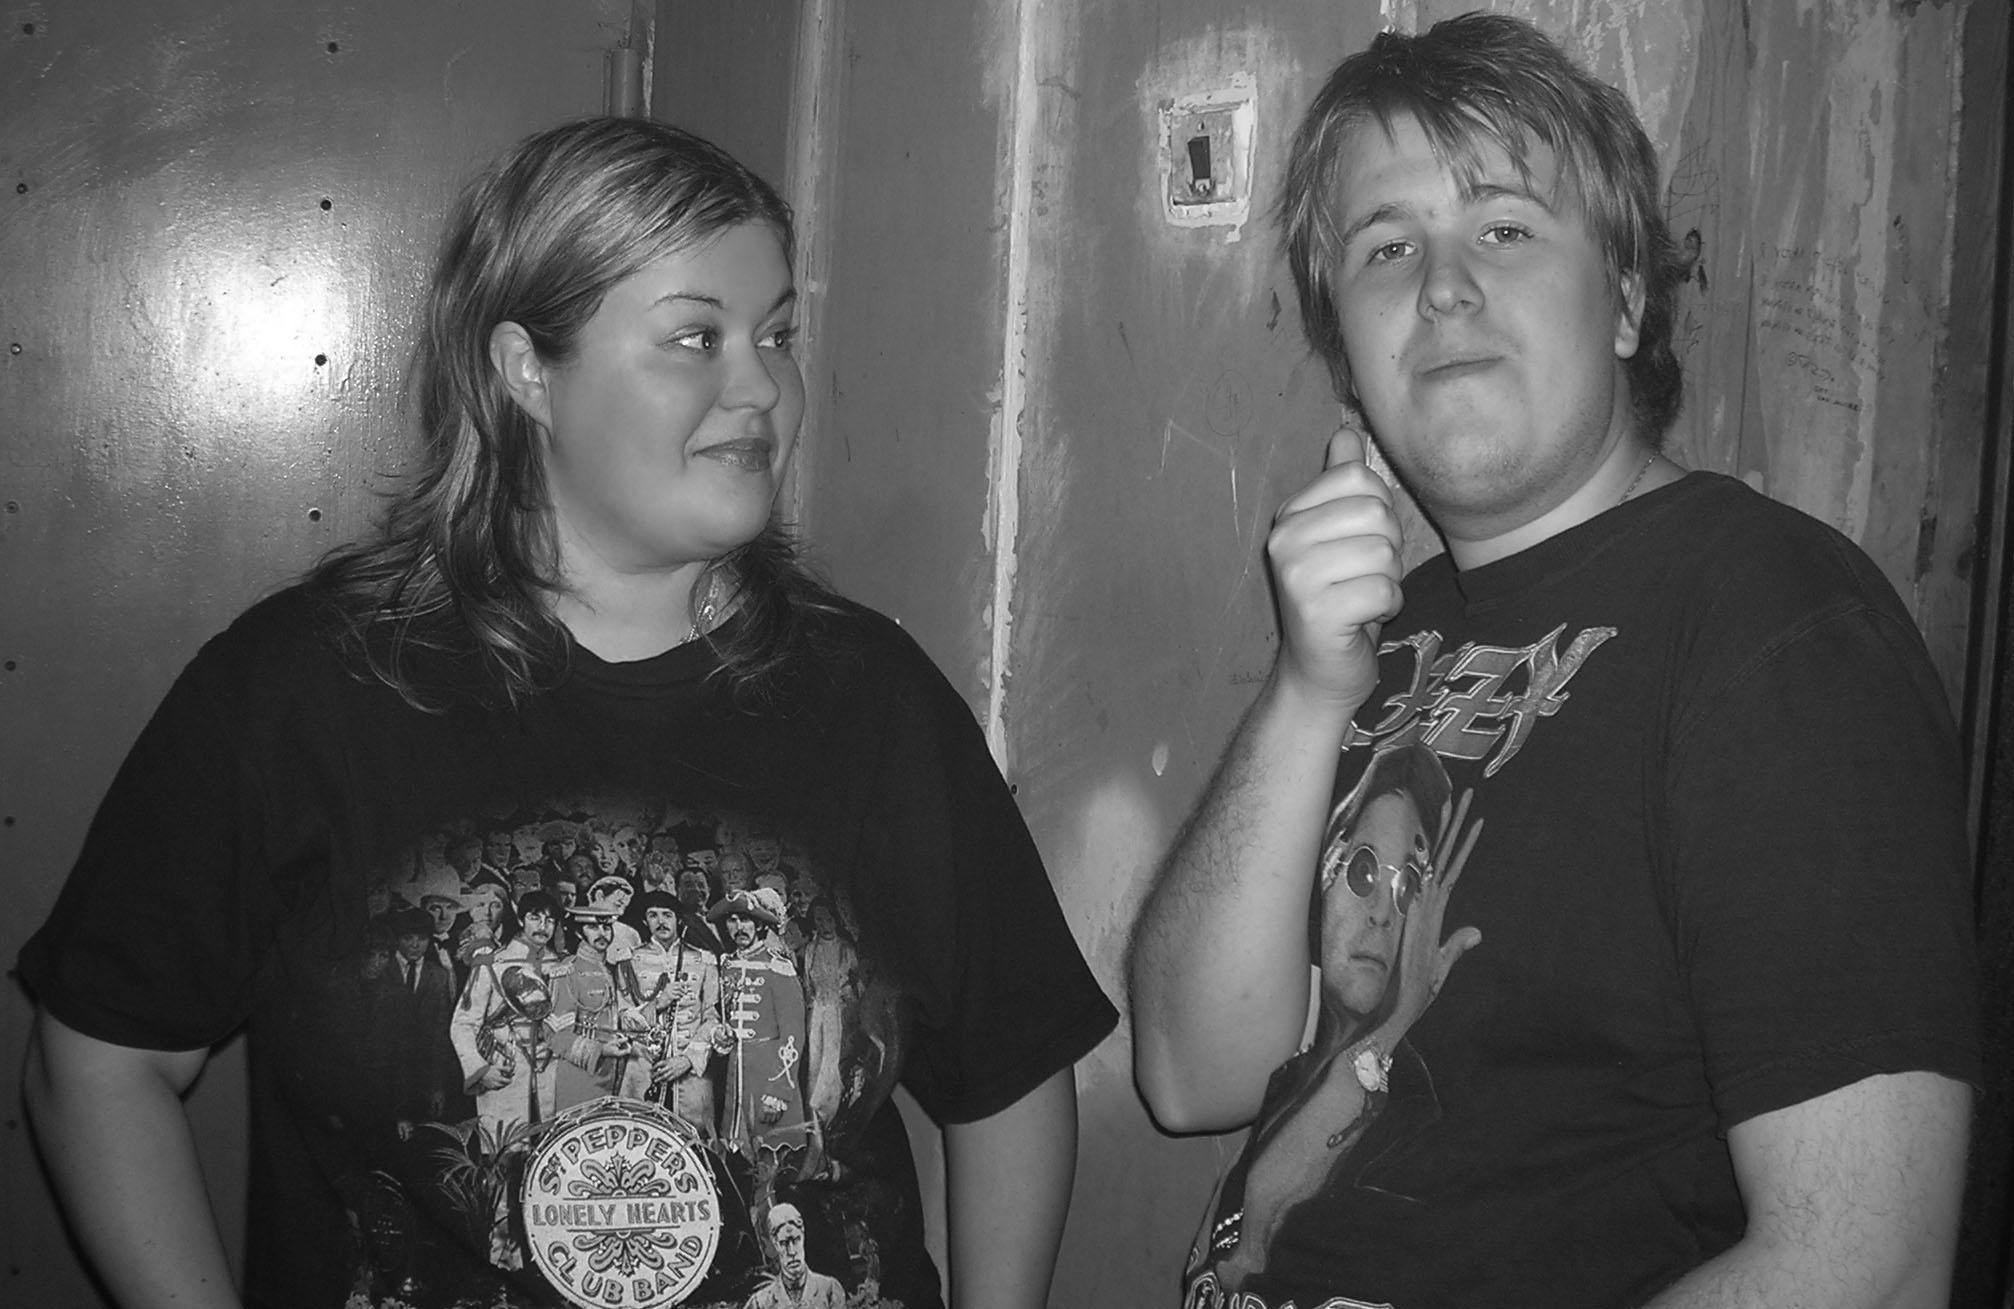 2005, на репетиции, вокалистка Света Гудёж и клавишник Олег Похвалин